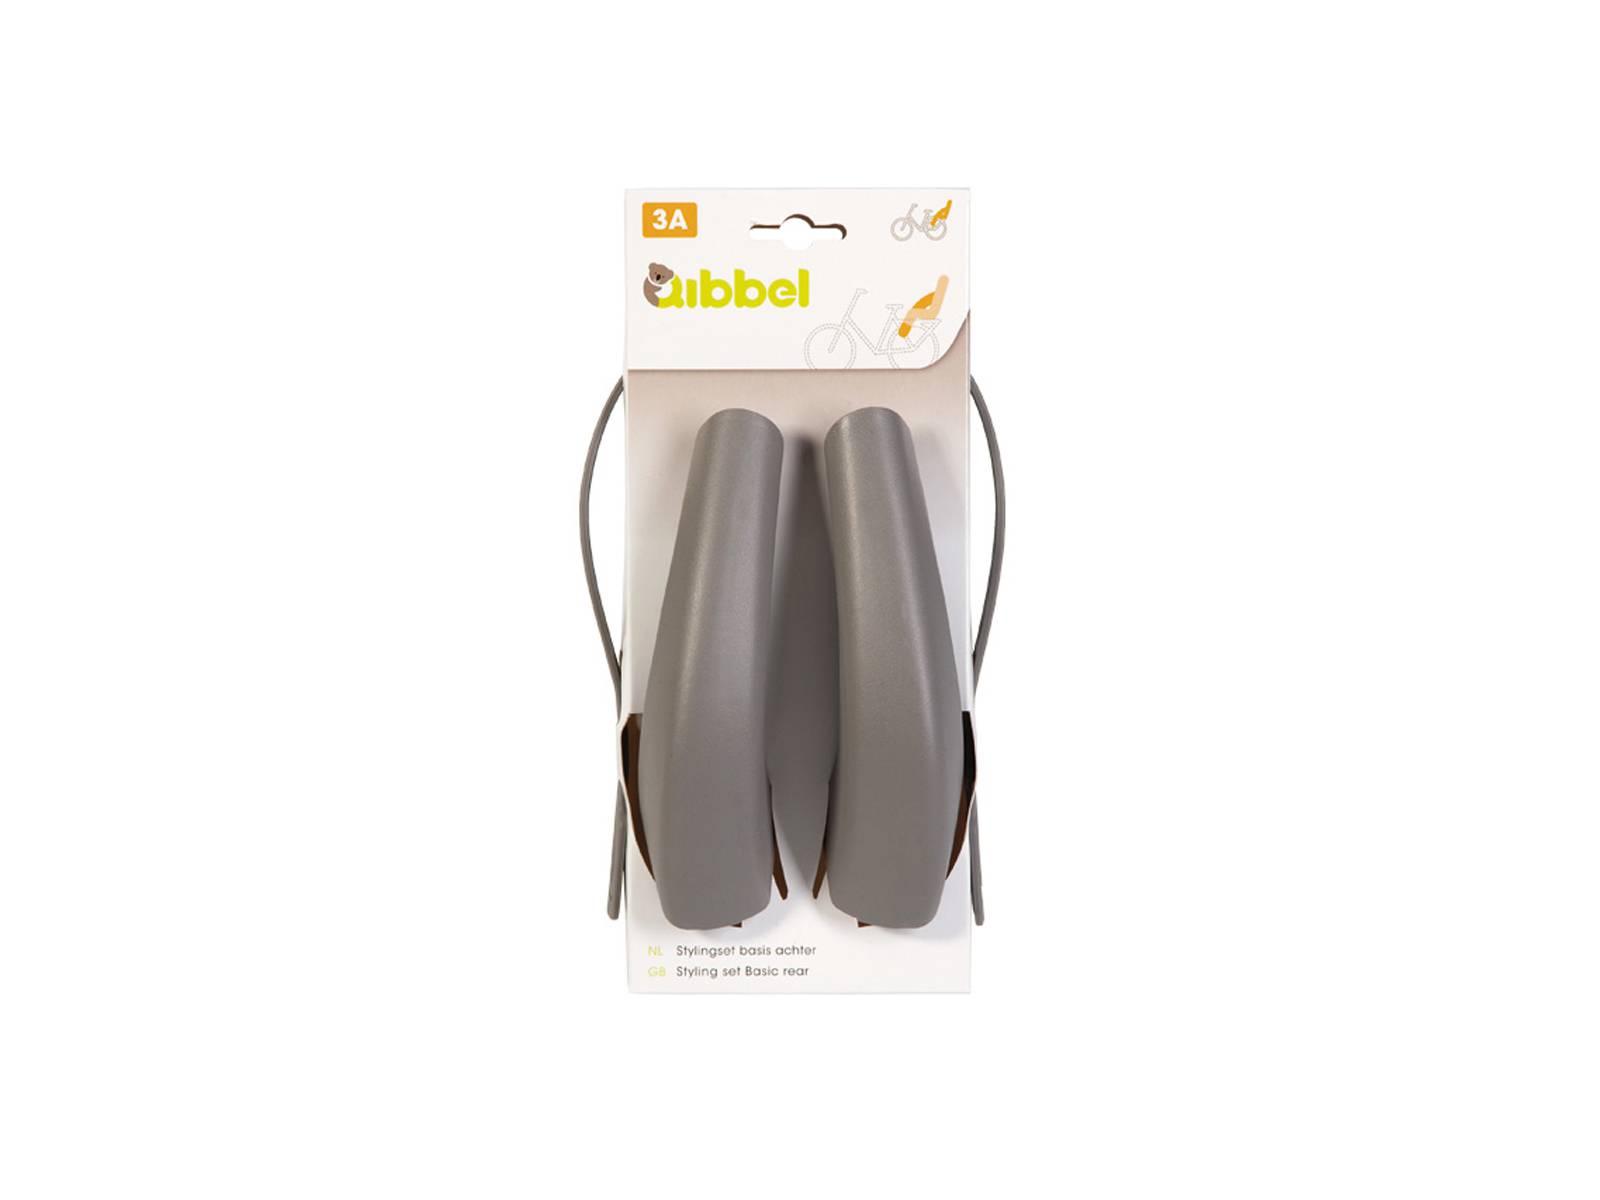 Qibbel stylingset BASIS achterzitje grijs